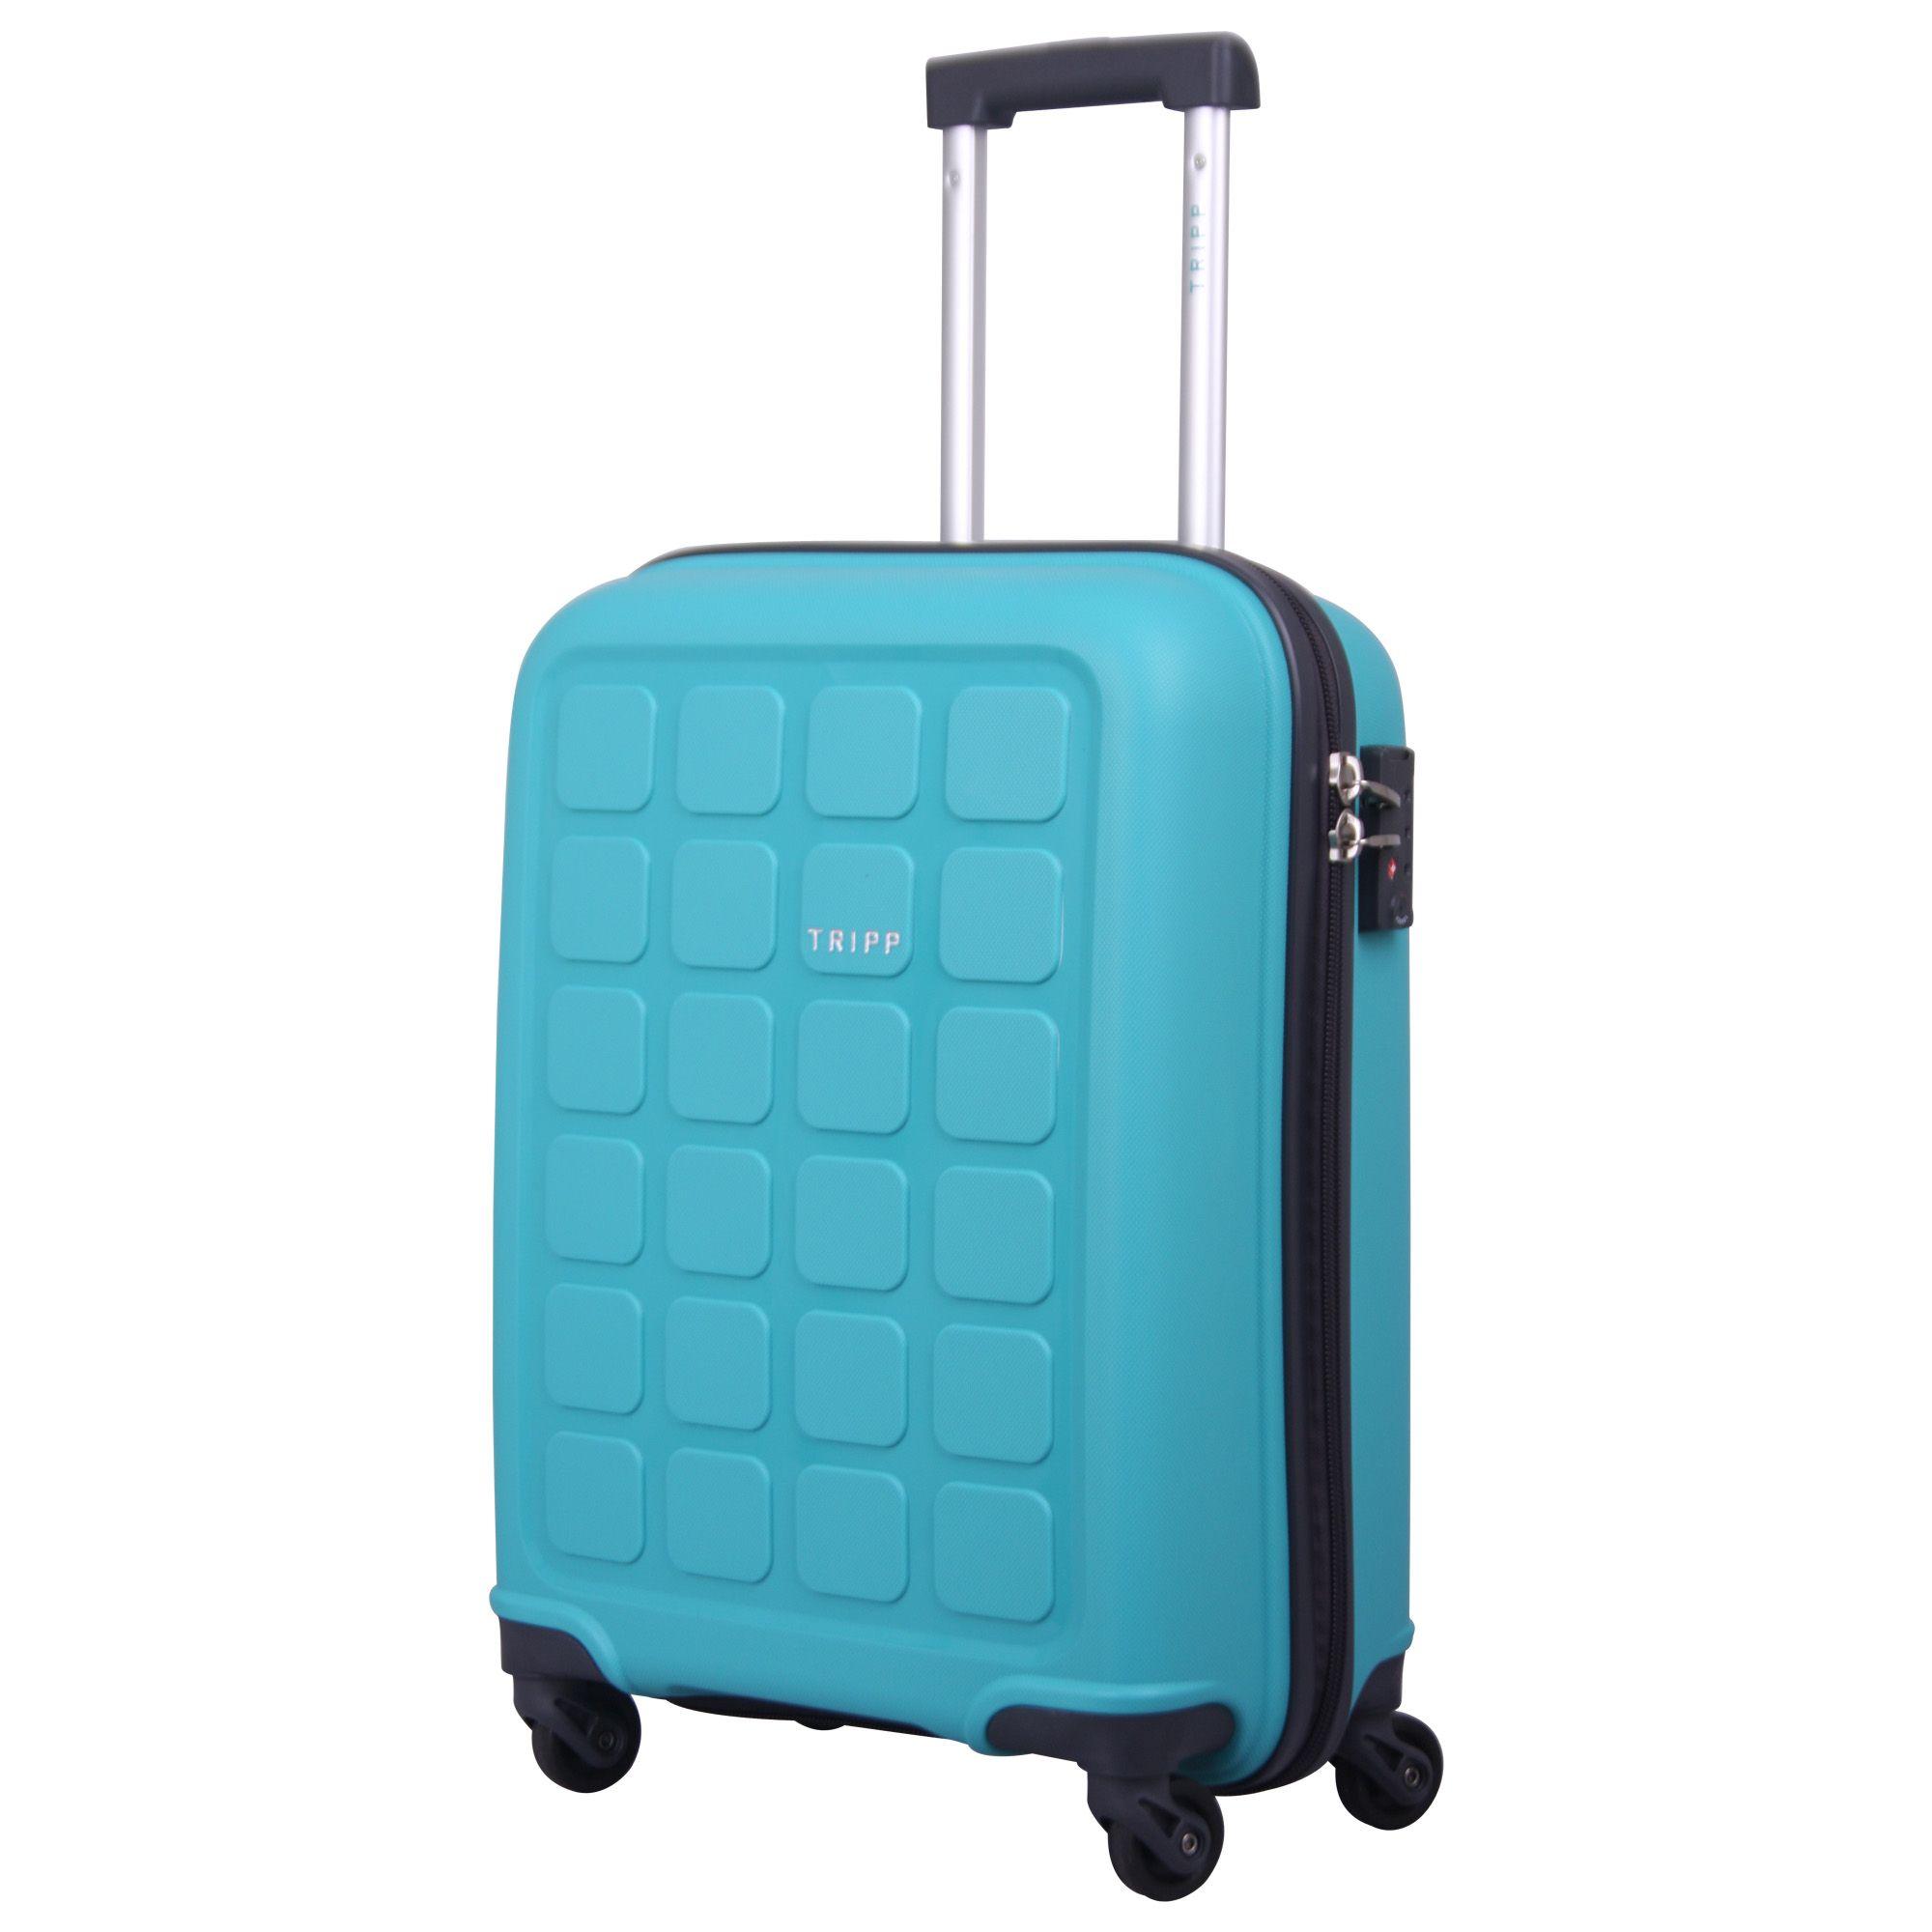 tripp mint 39 holiday 6 39 cabin 4 wheel suitcase hard. Black Bedroom Furniture Sets. Home Design Ideas